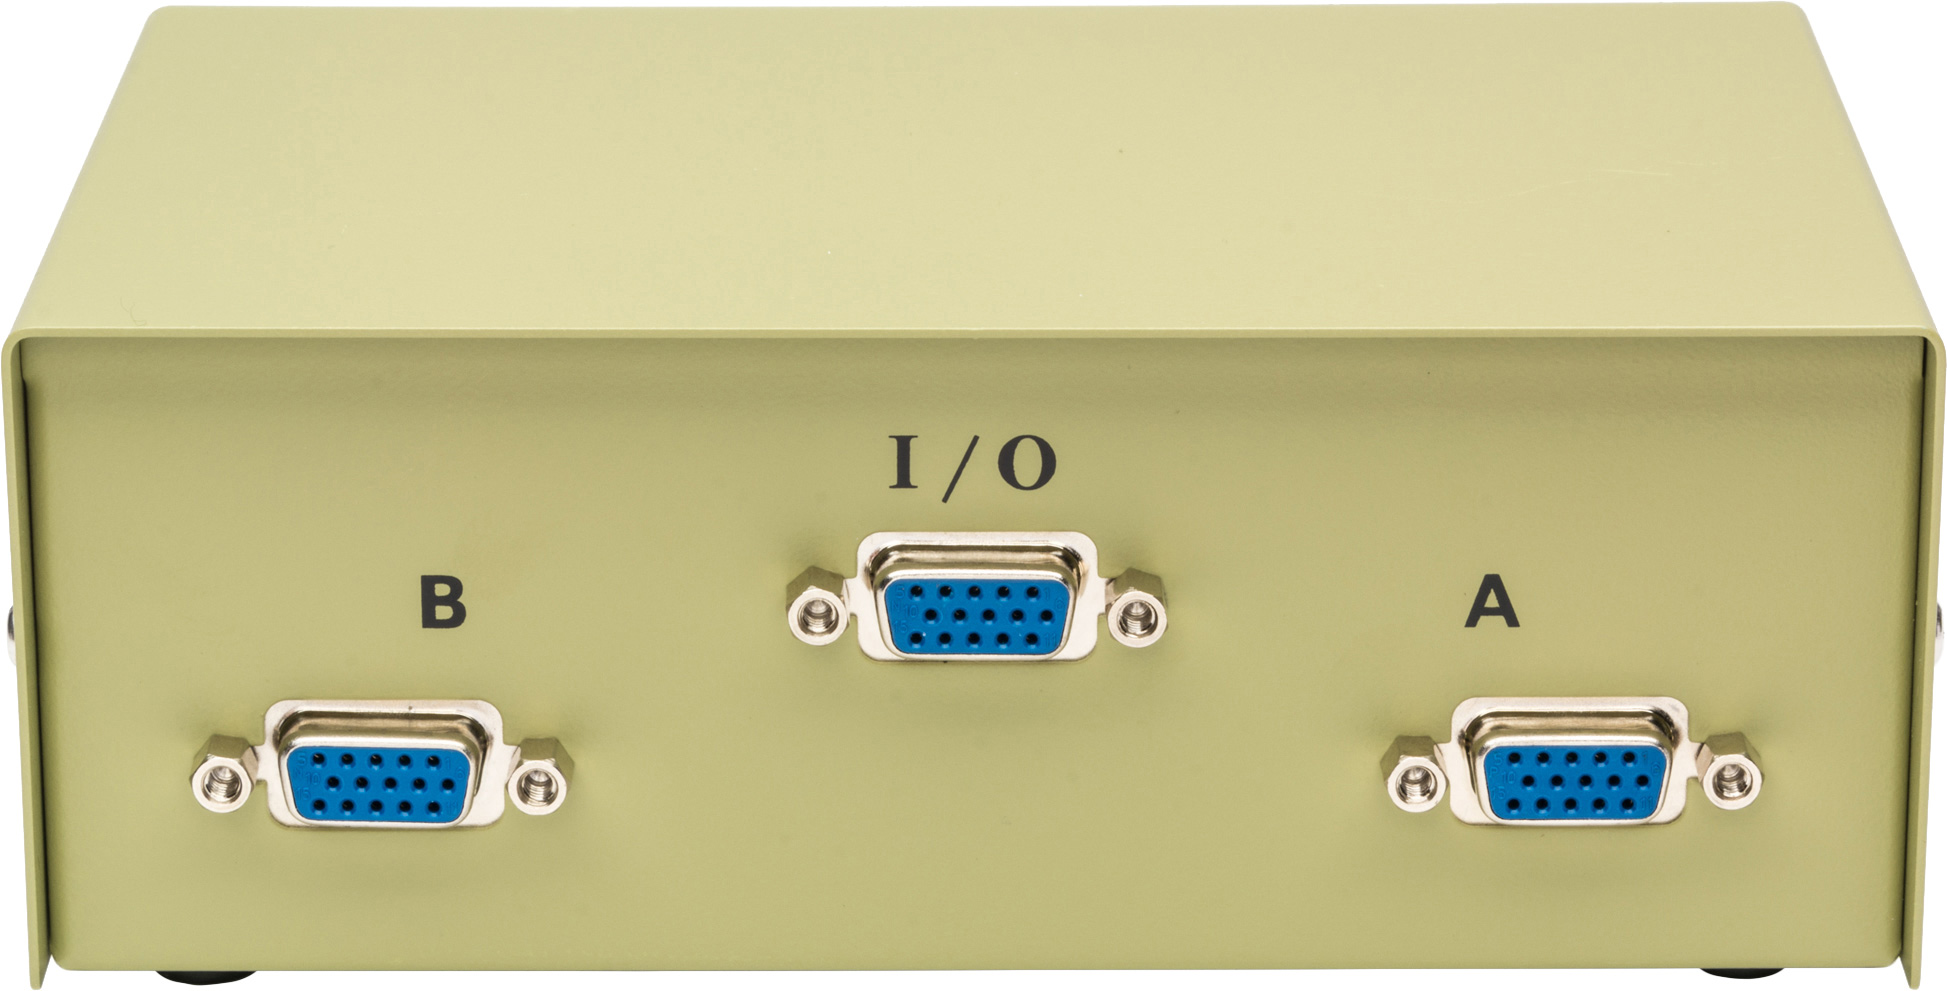 High Density 15 Pin Ab Vga 1x2 Switchbox 2 Way Switch Box Zoom